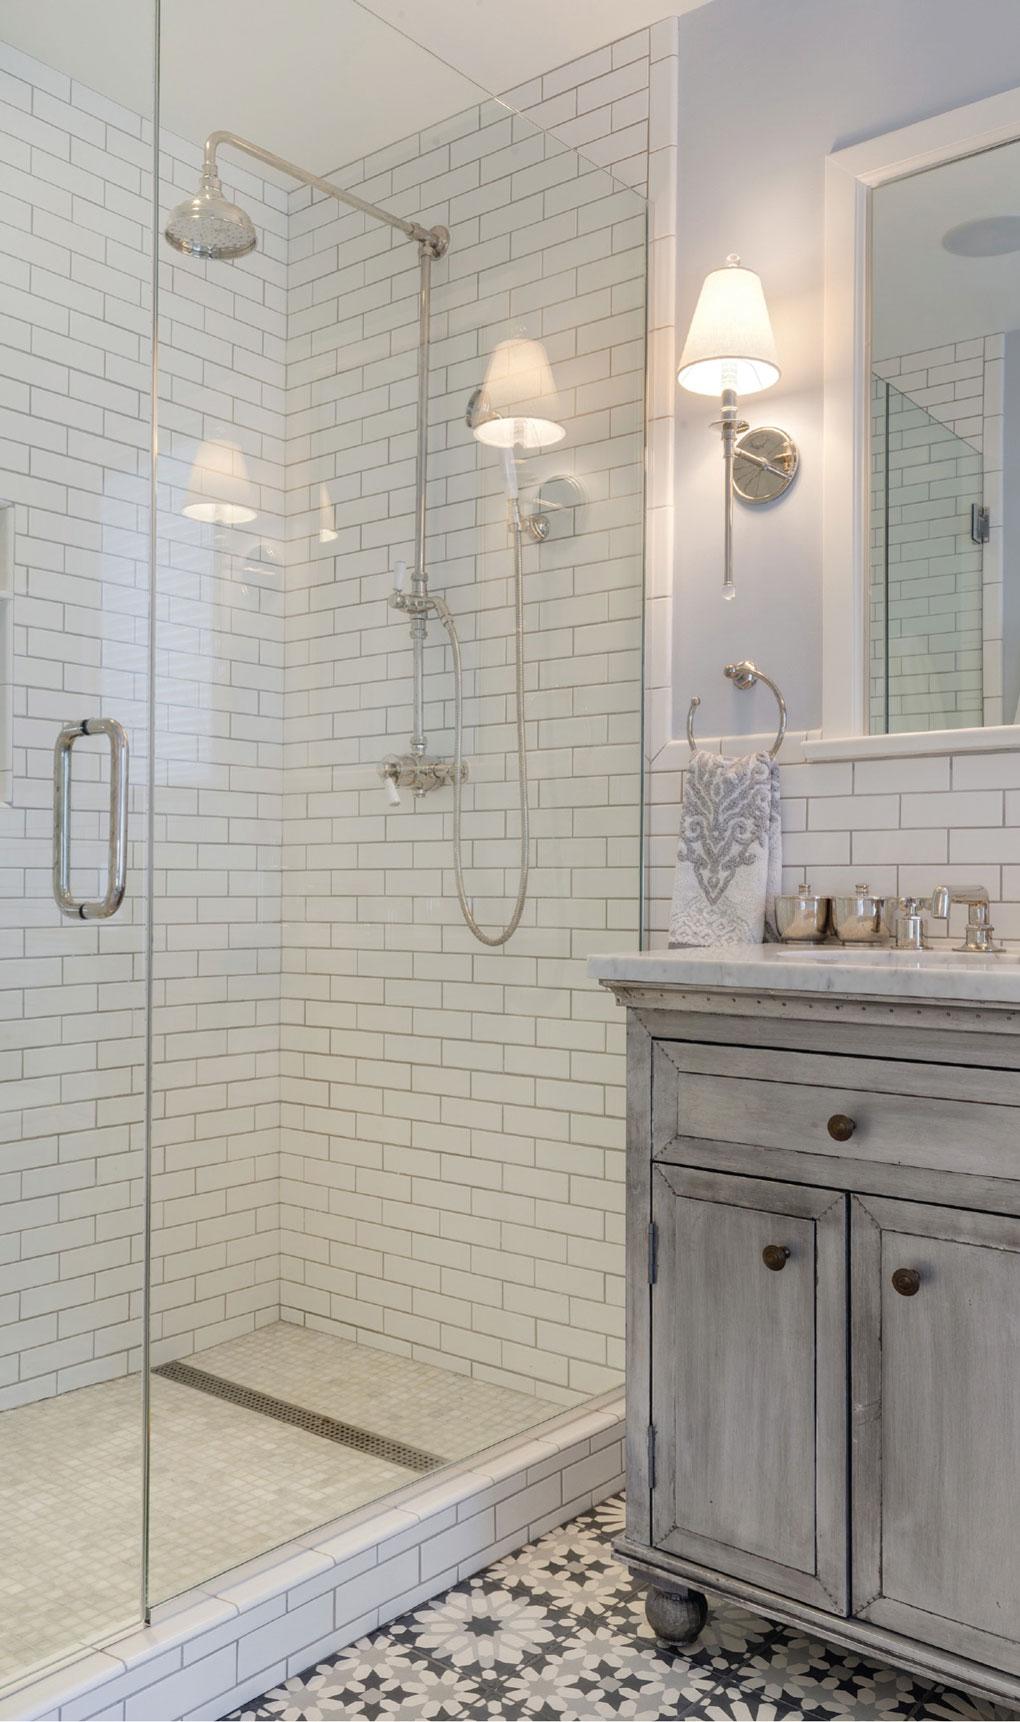 Mast bath features subway tile and Carrara marble